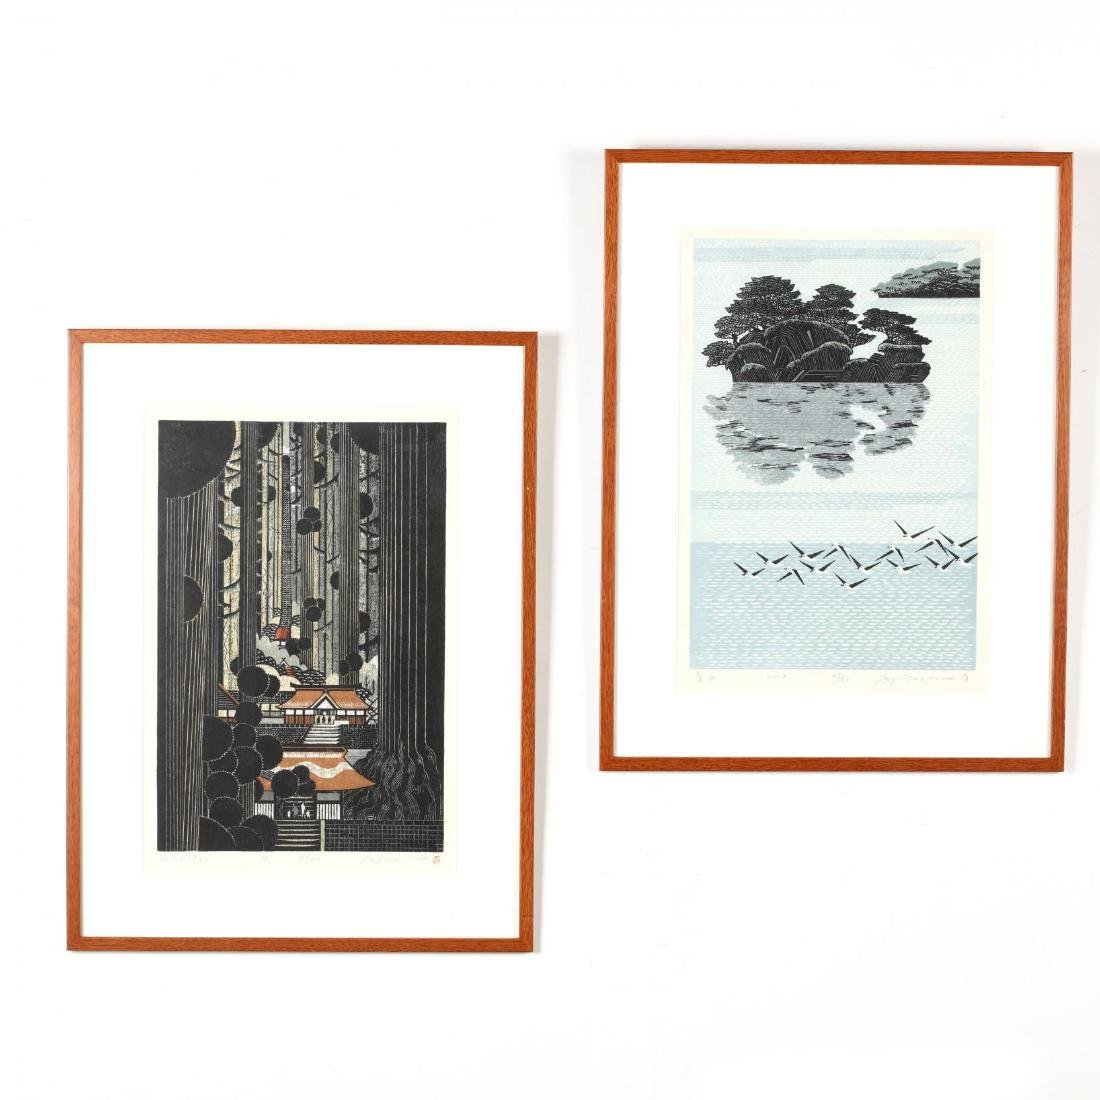 Two Japanese Woodblock Prints by Ray Morimura (b. 1948)